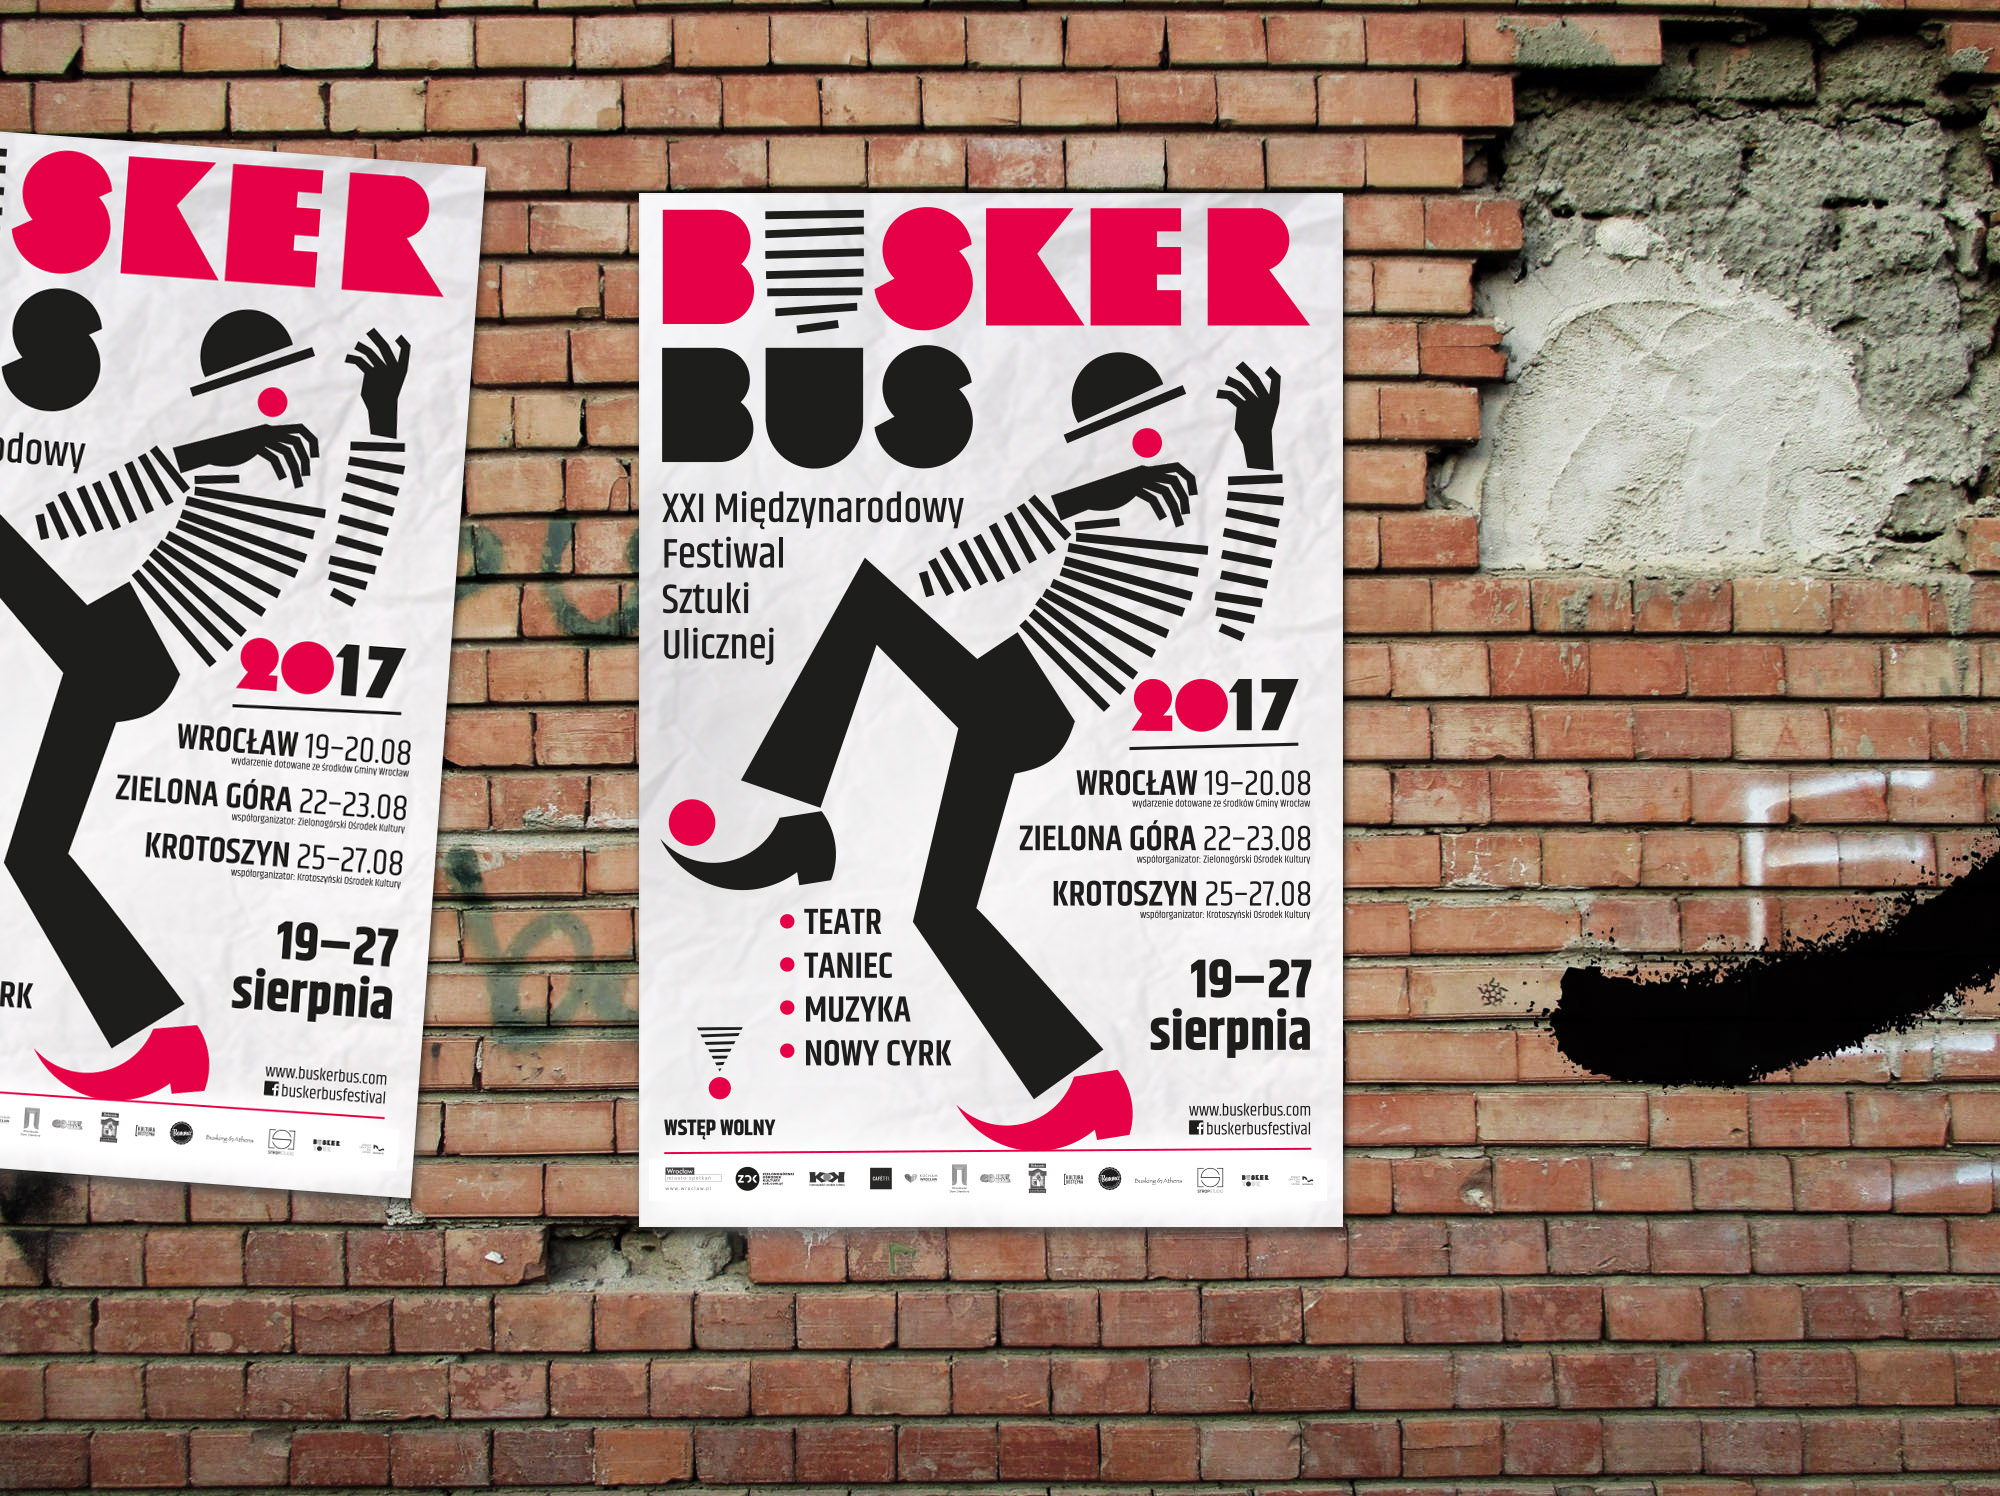 Festiwal sztuki ulicznej Busker Bus